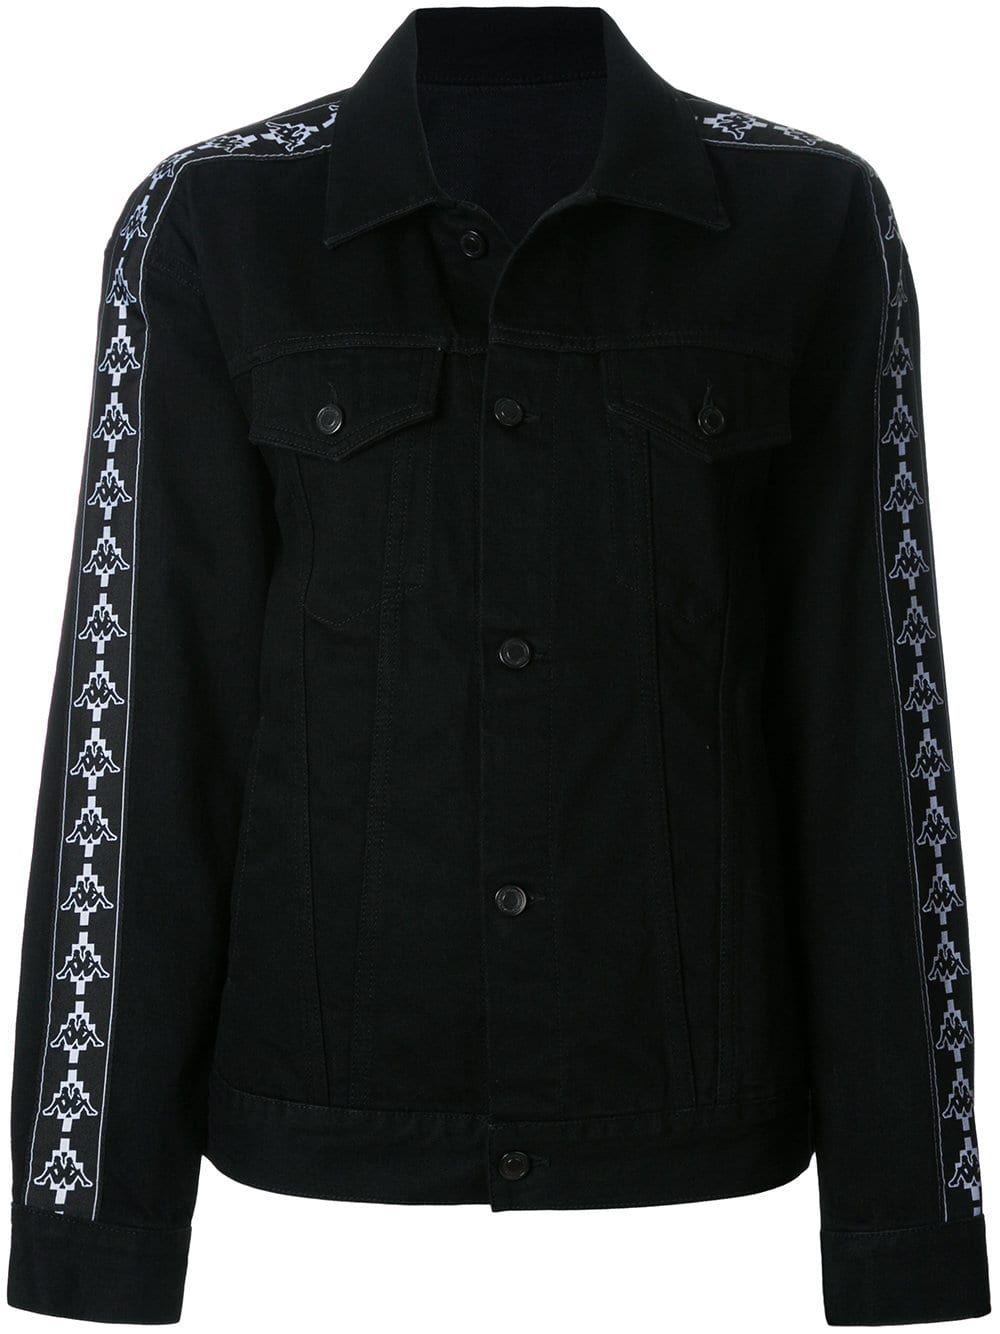 Marcelo Burlon County Of Milan Kappa Denim Jacket Farfetch Denim Jacket Jackets Black Denim Jacket [ 1334 x 1000 Pixel ]